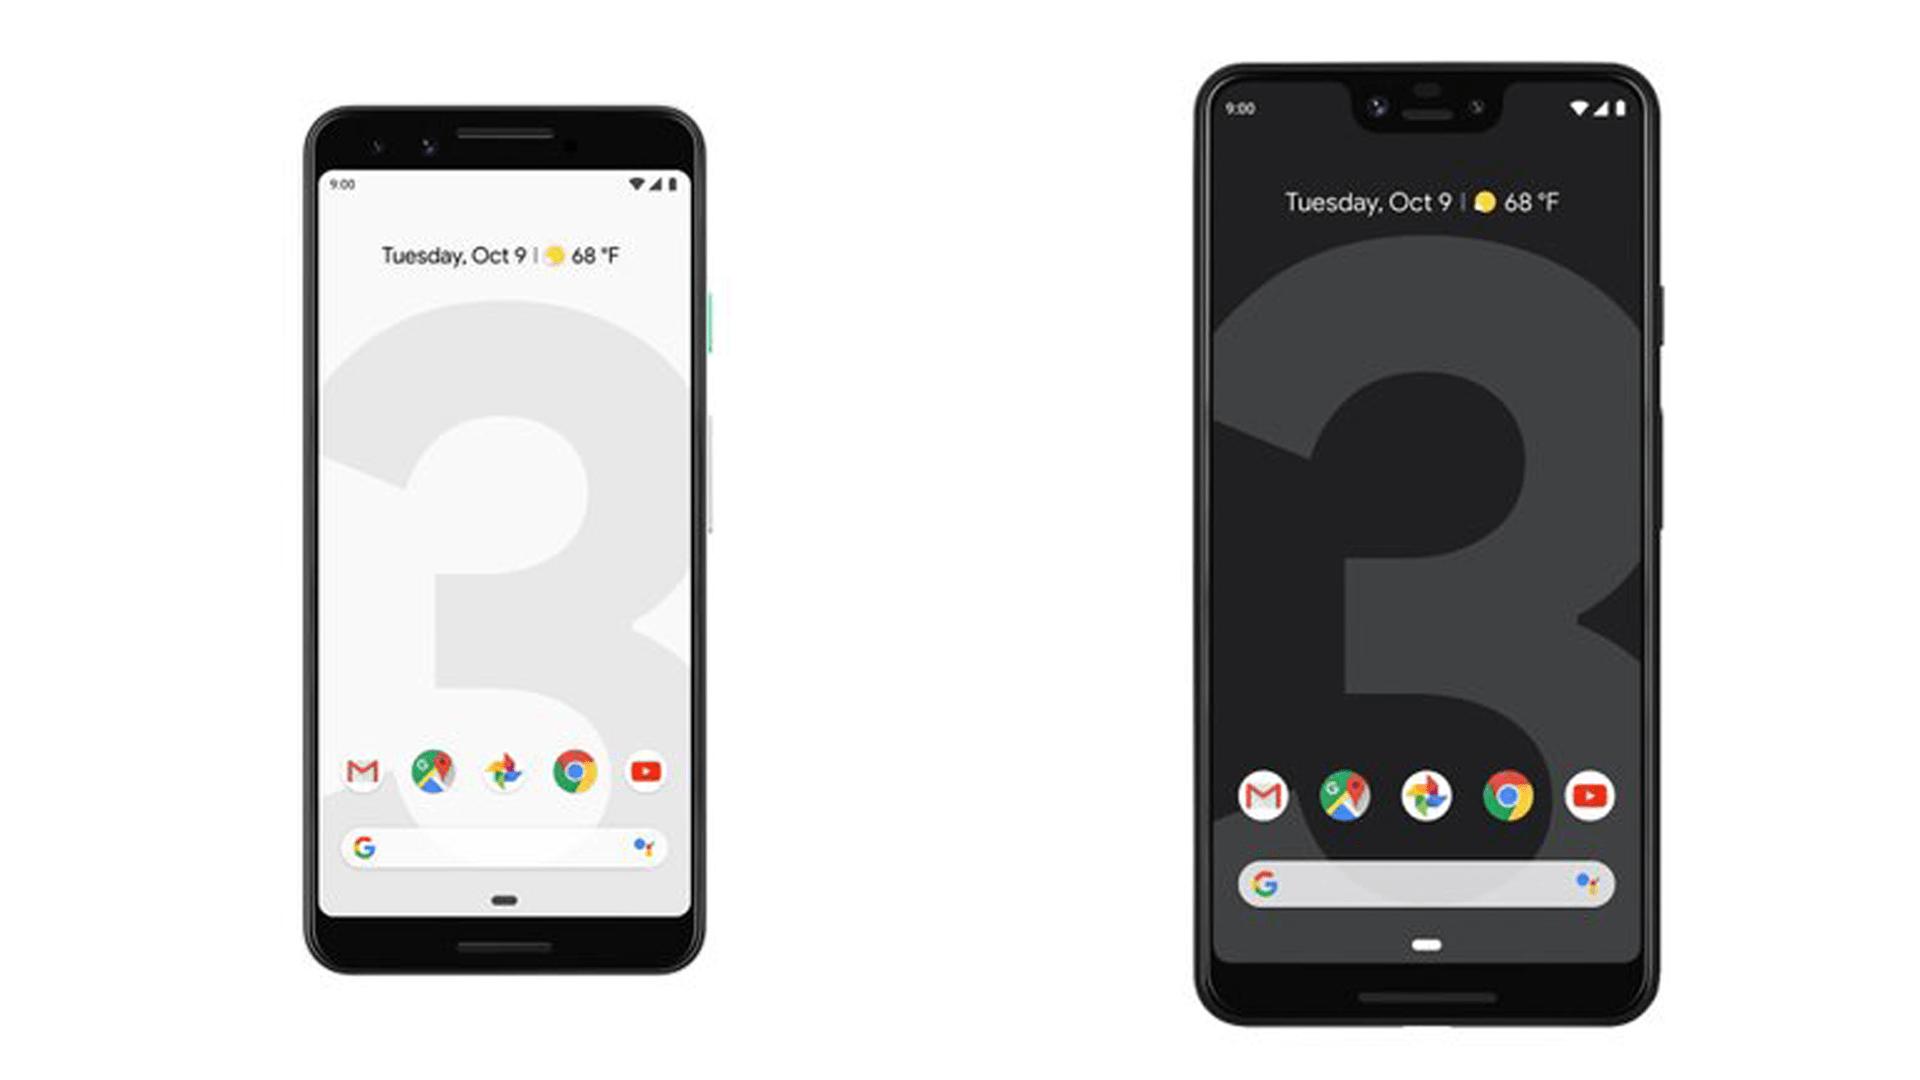 Google Pixel 3 XL vs Samsung Galaxy Note 9 vs Huawei P20 Pro